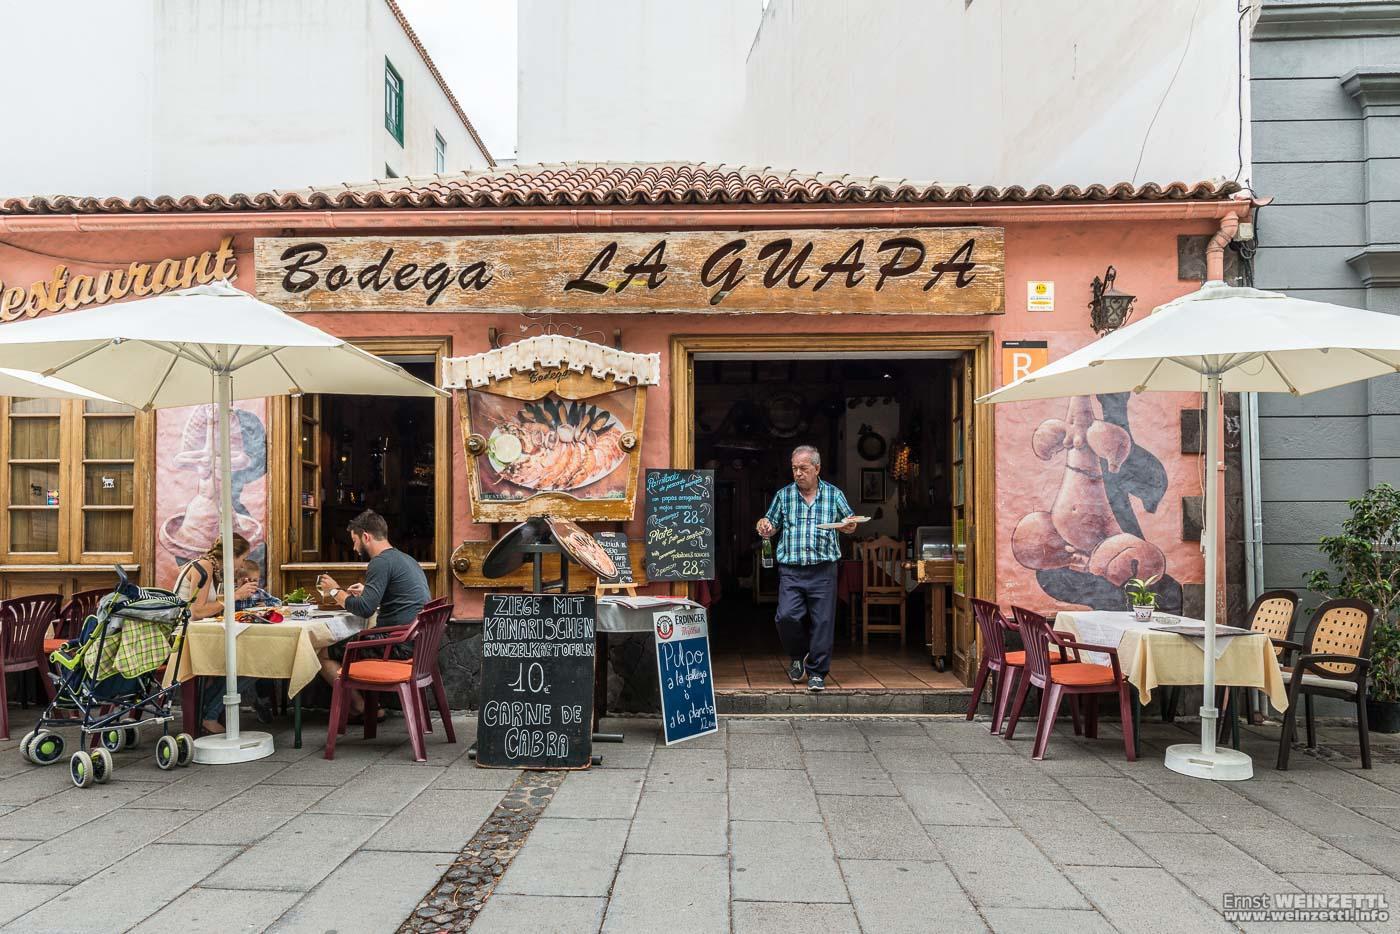 Die Bodega la Guapa in der Calle Puerto Viejo.